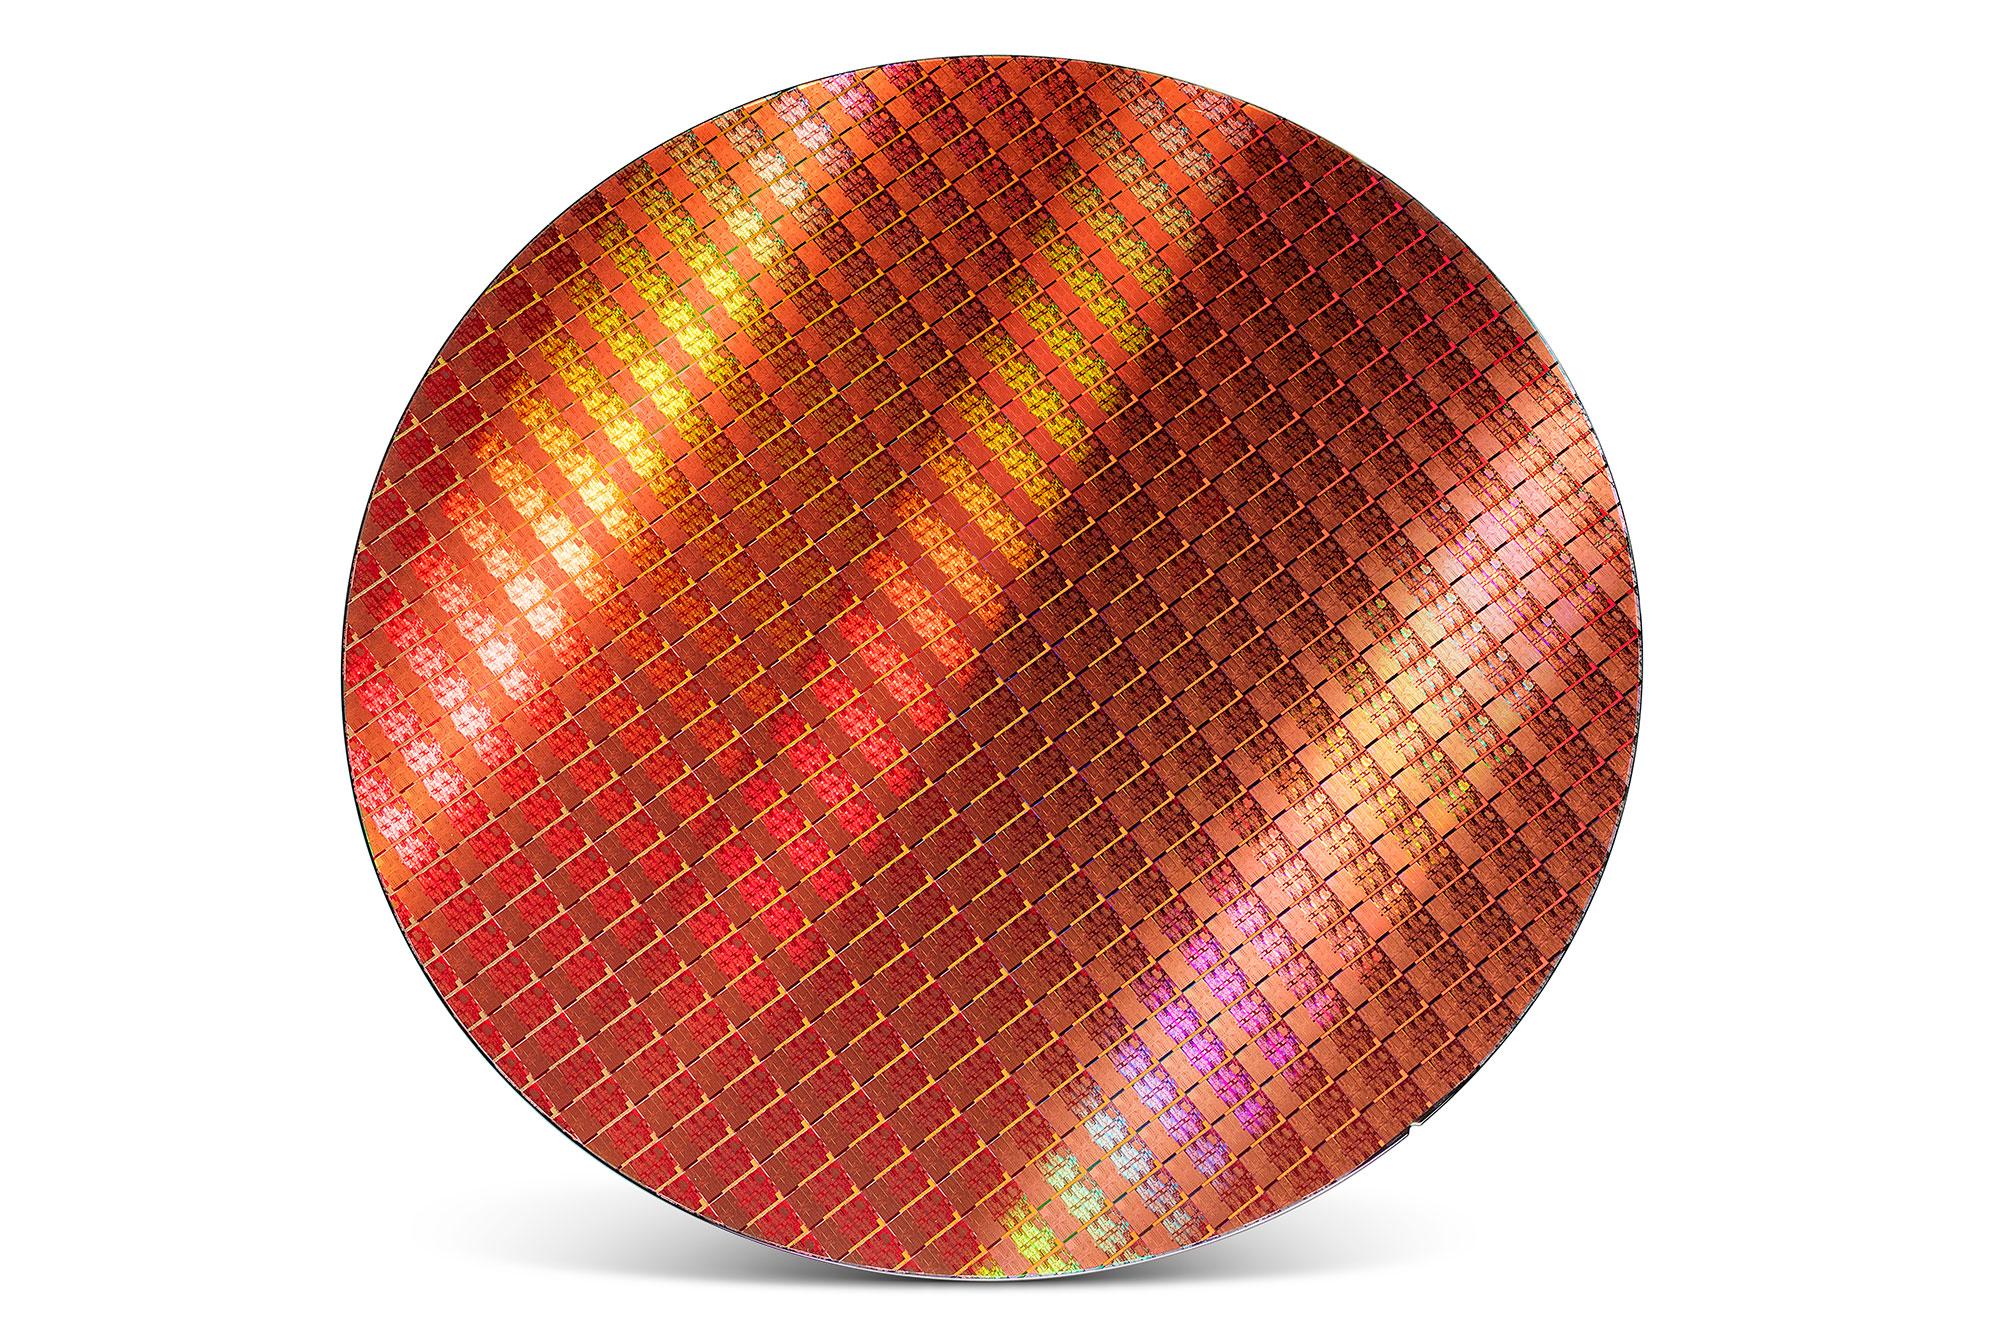 frontal-wafer-a-04-8000pixels.jpg